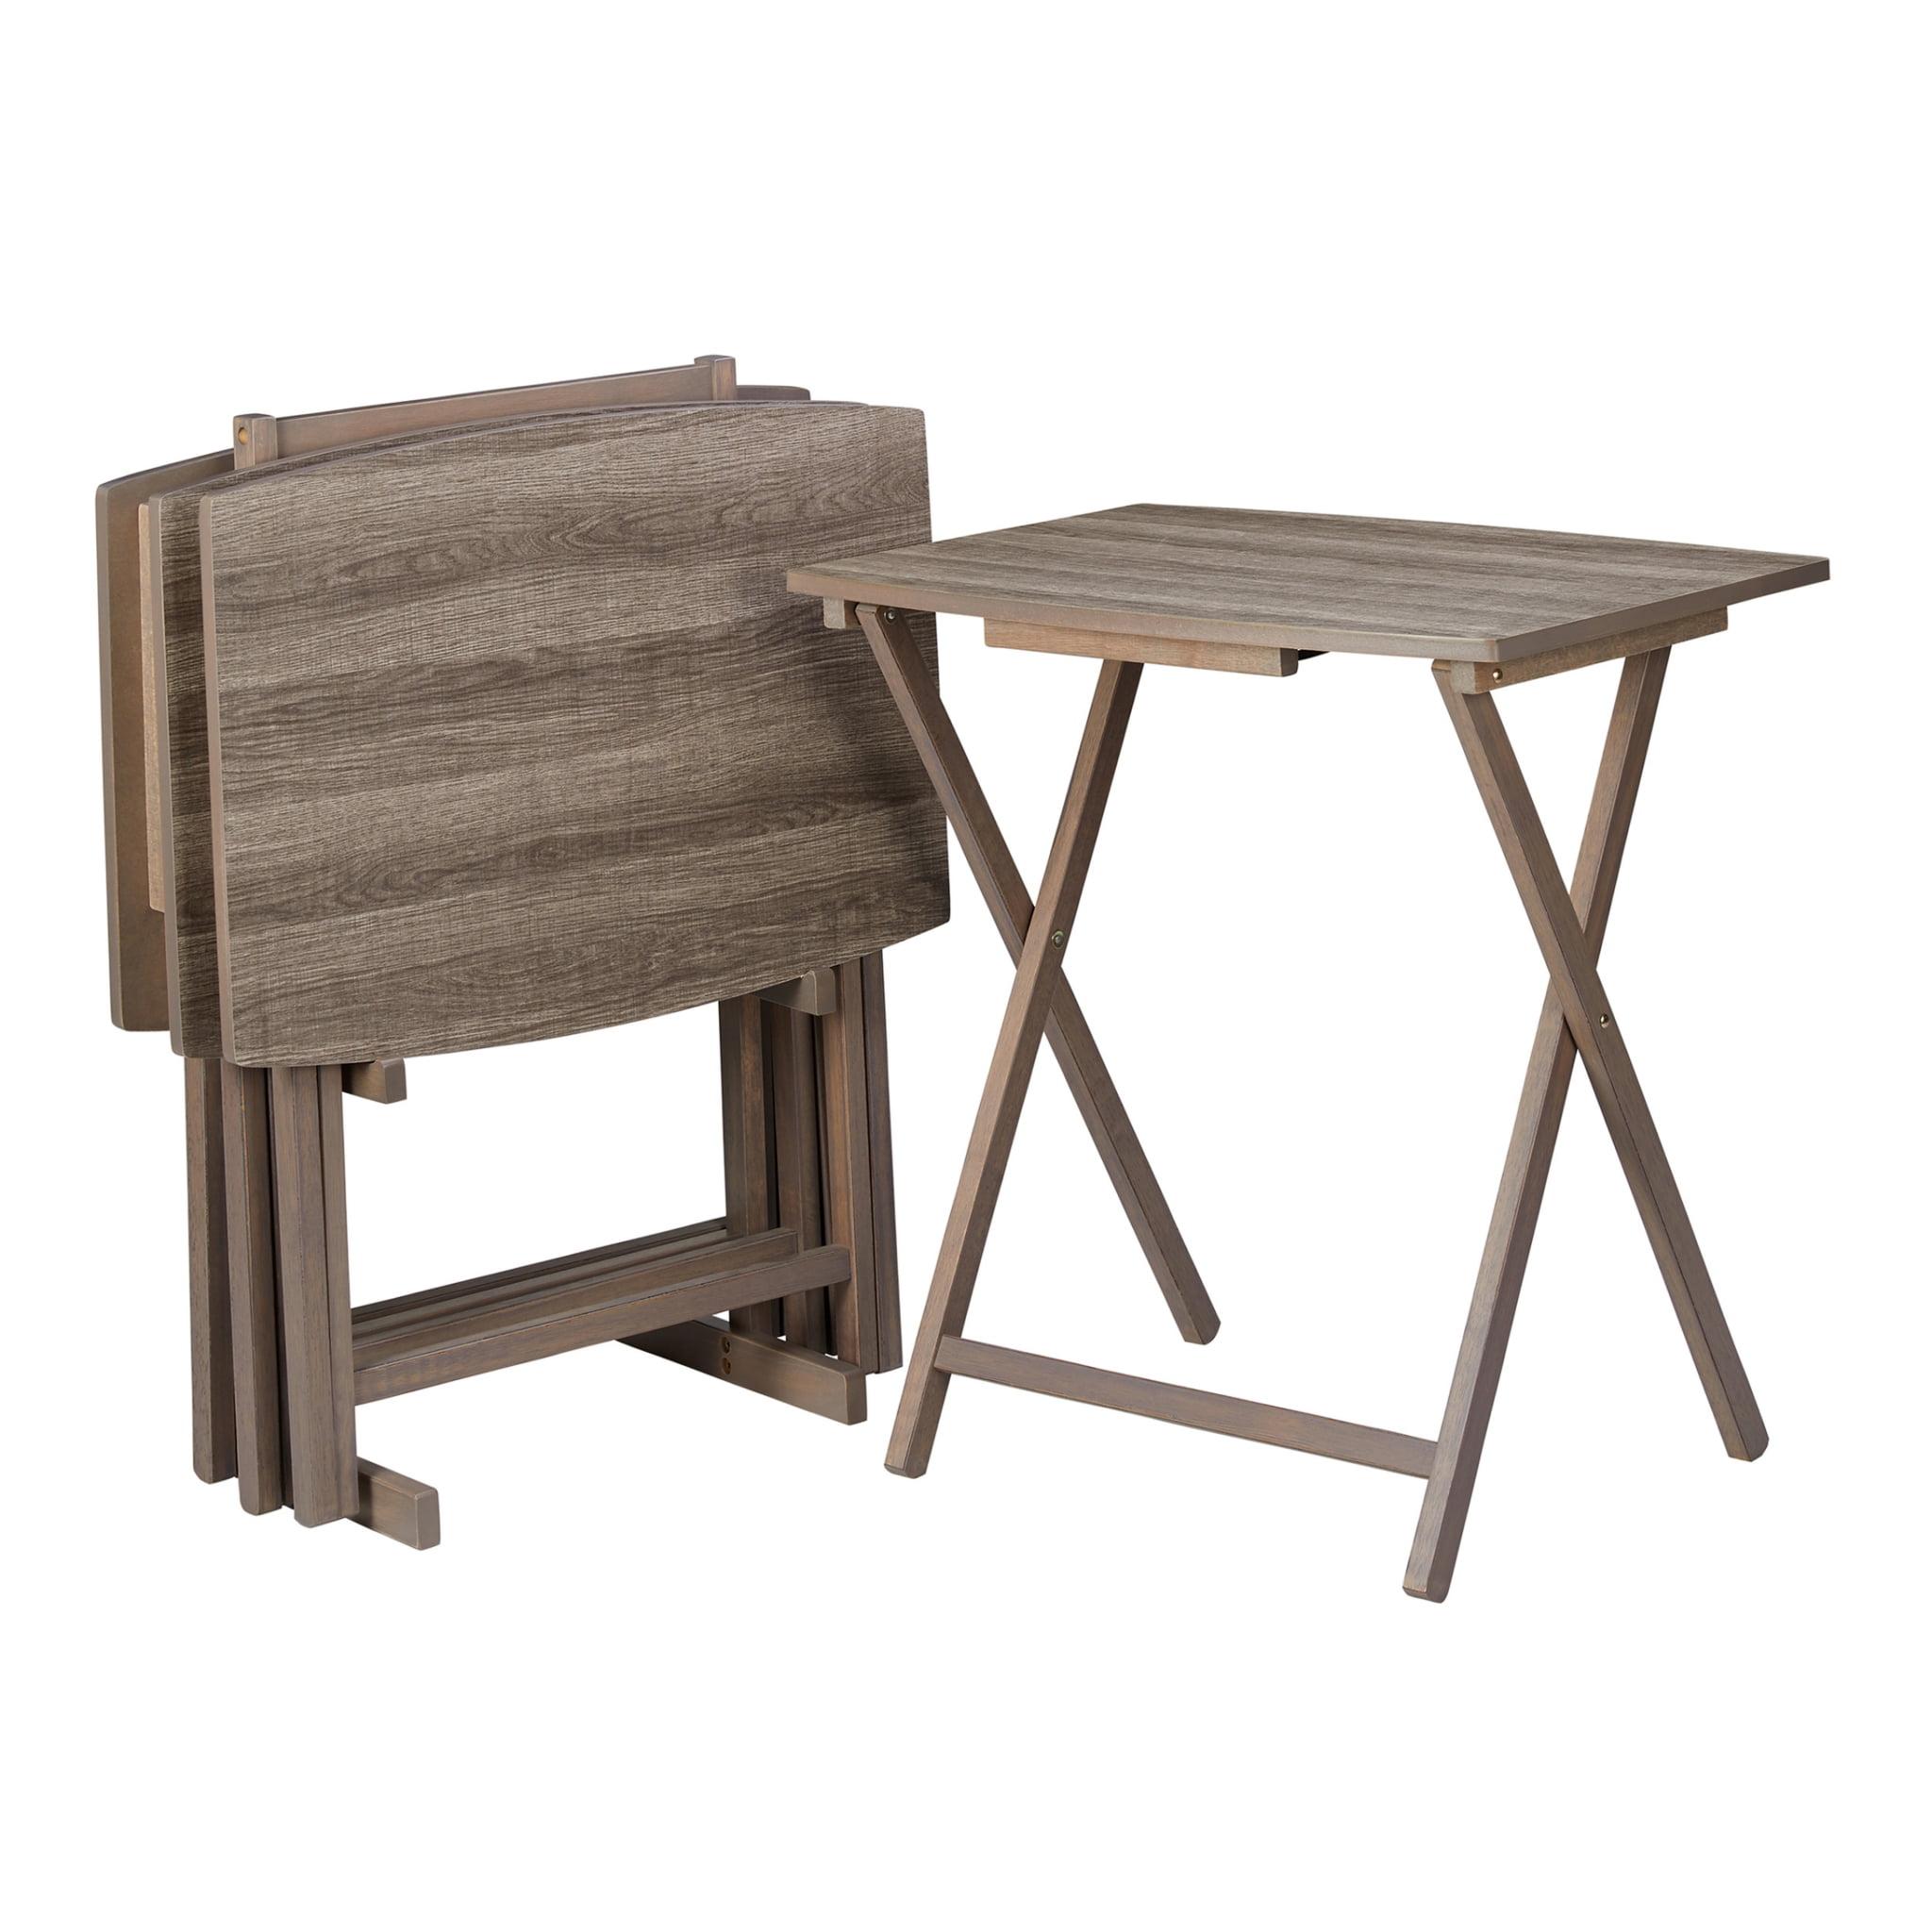 Mainstays 5 Piece Folding Xl Oversized Tray Table Set Rustic Gray Walmart Com Walmart Com